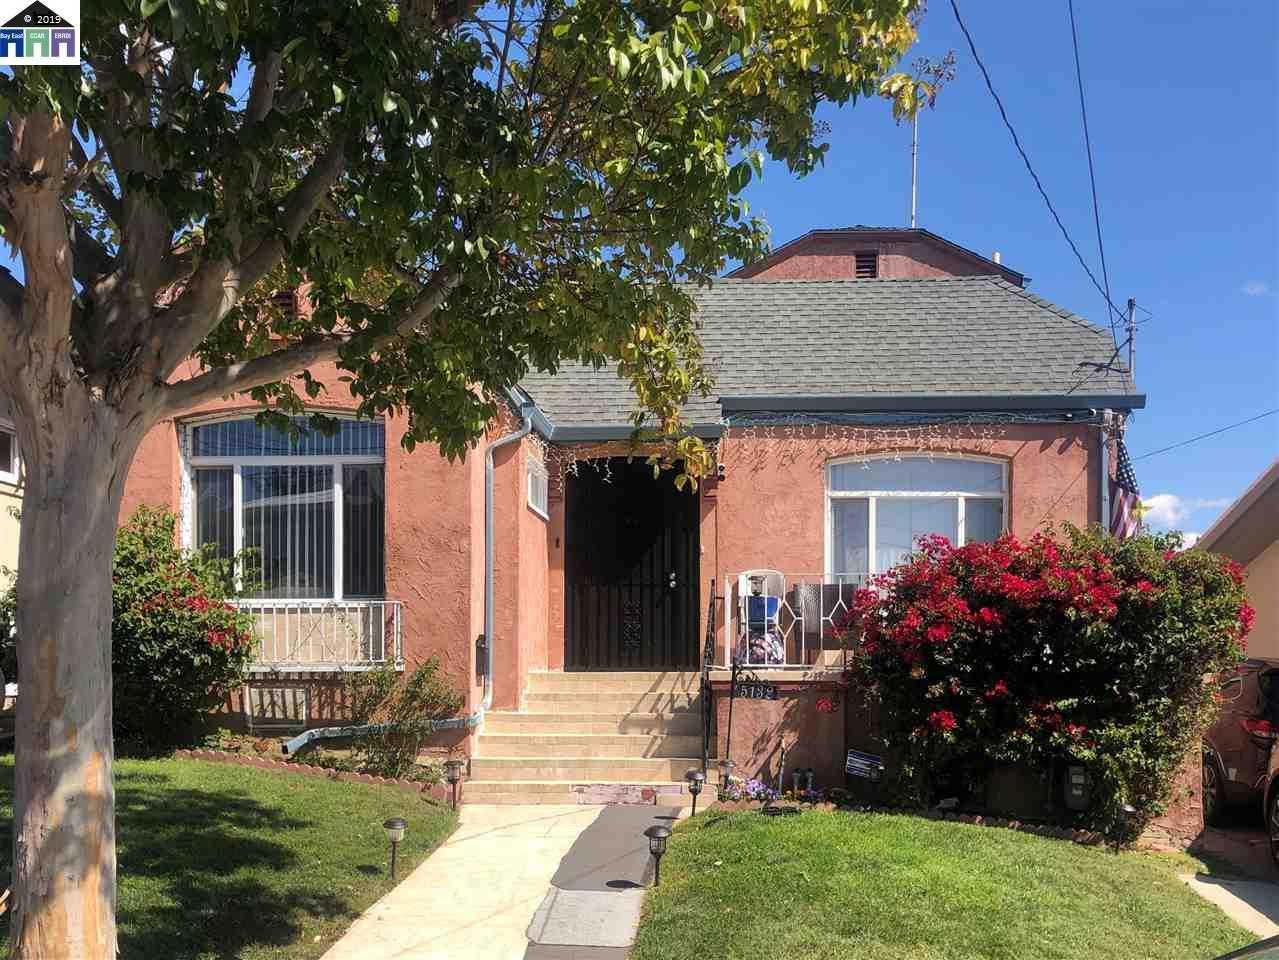 $998,000 - 4Br/2Ba -  for Sale in Melrose Heights, Oakland